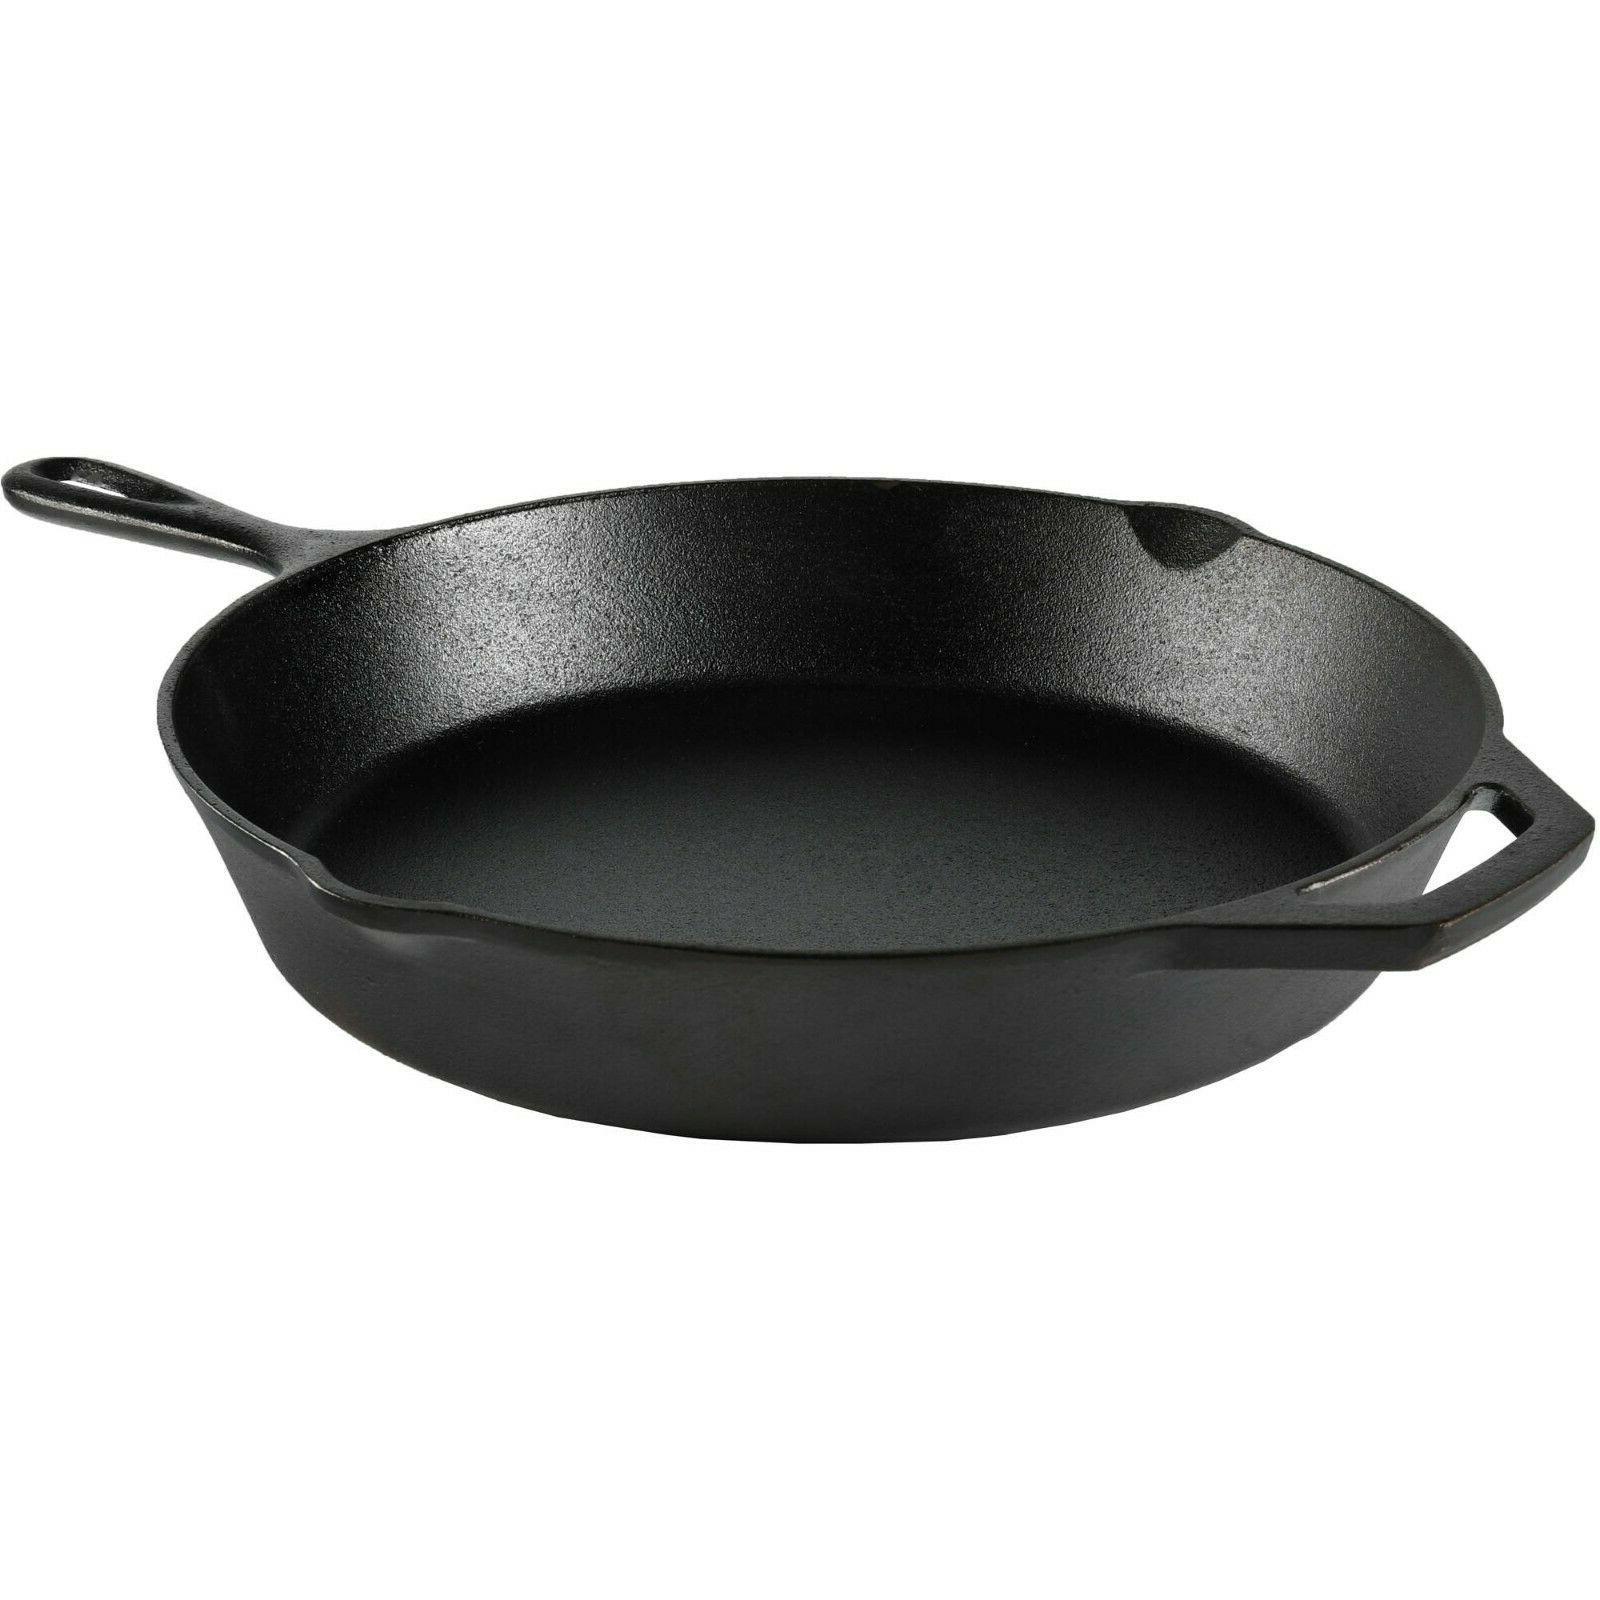 Cast Iron Frying Pan Skillet Pre-Seasoned Vintage Kitchen Fr